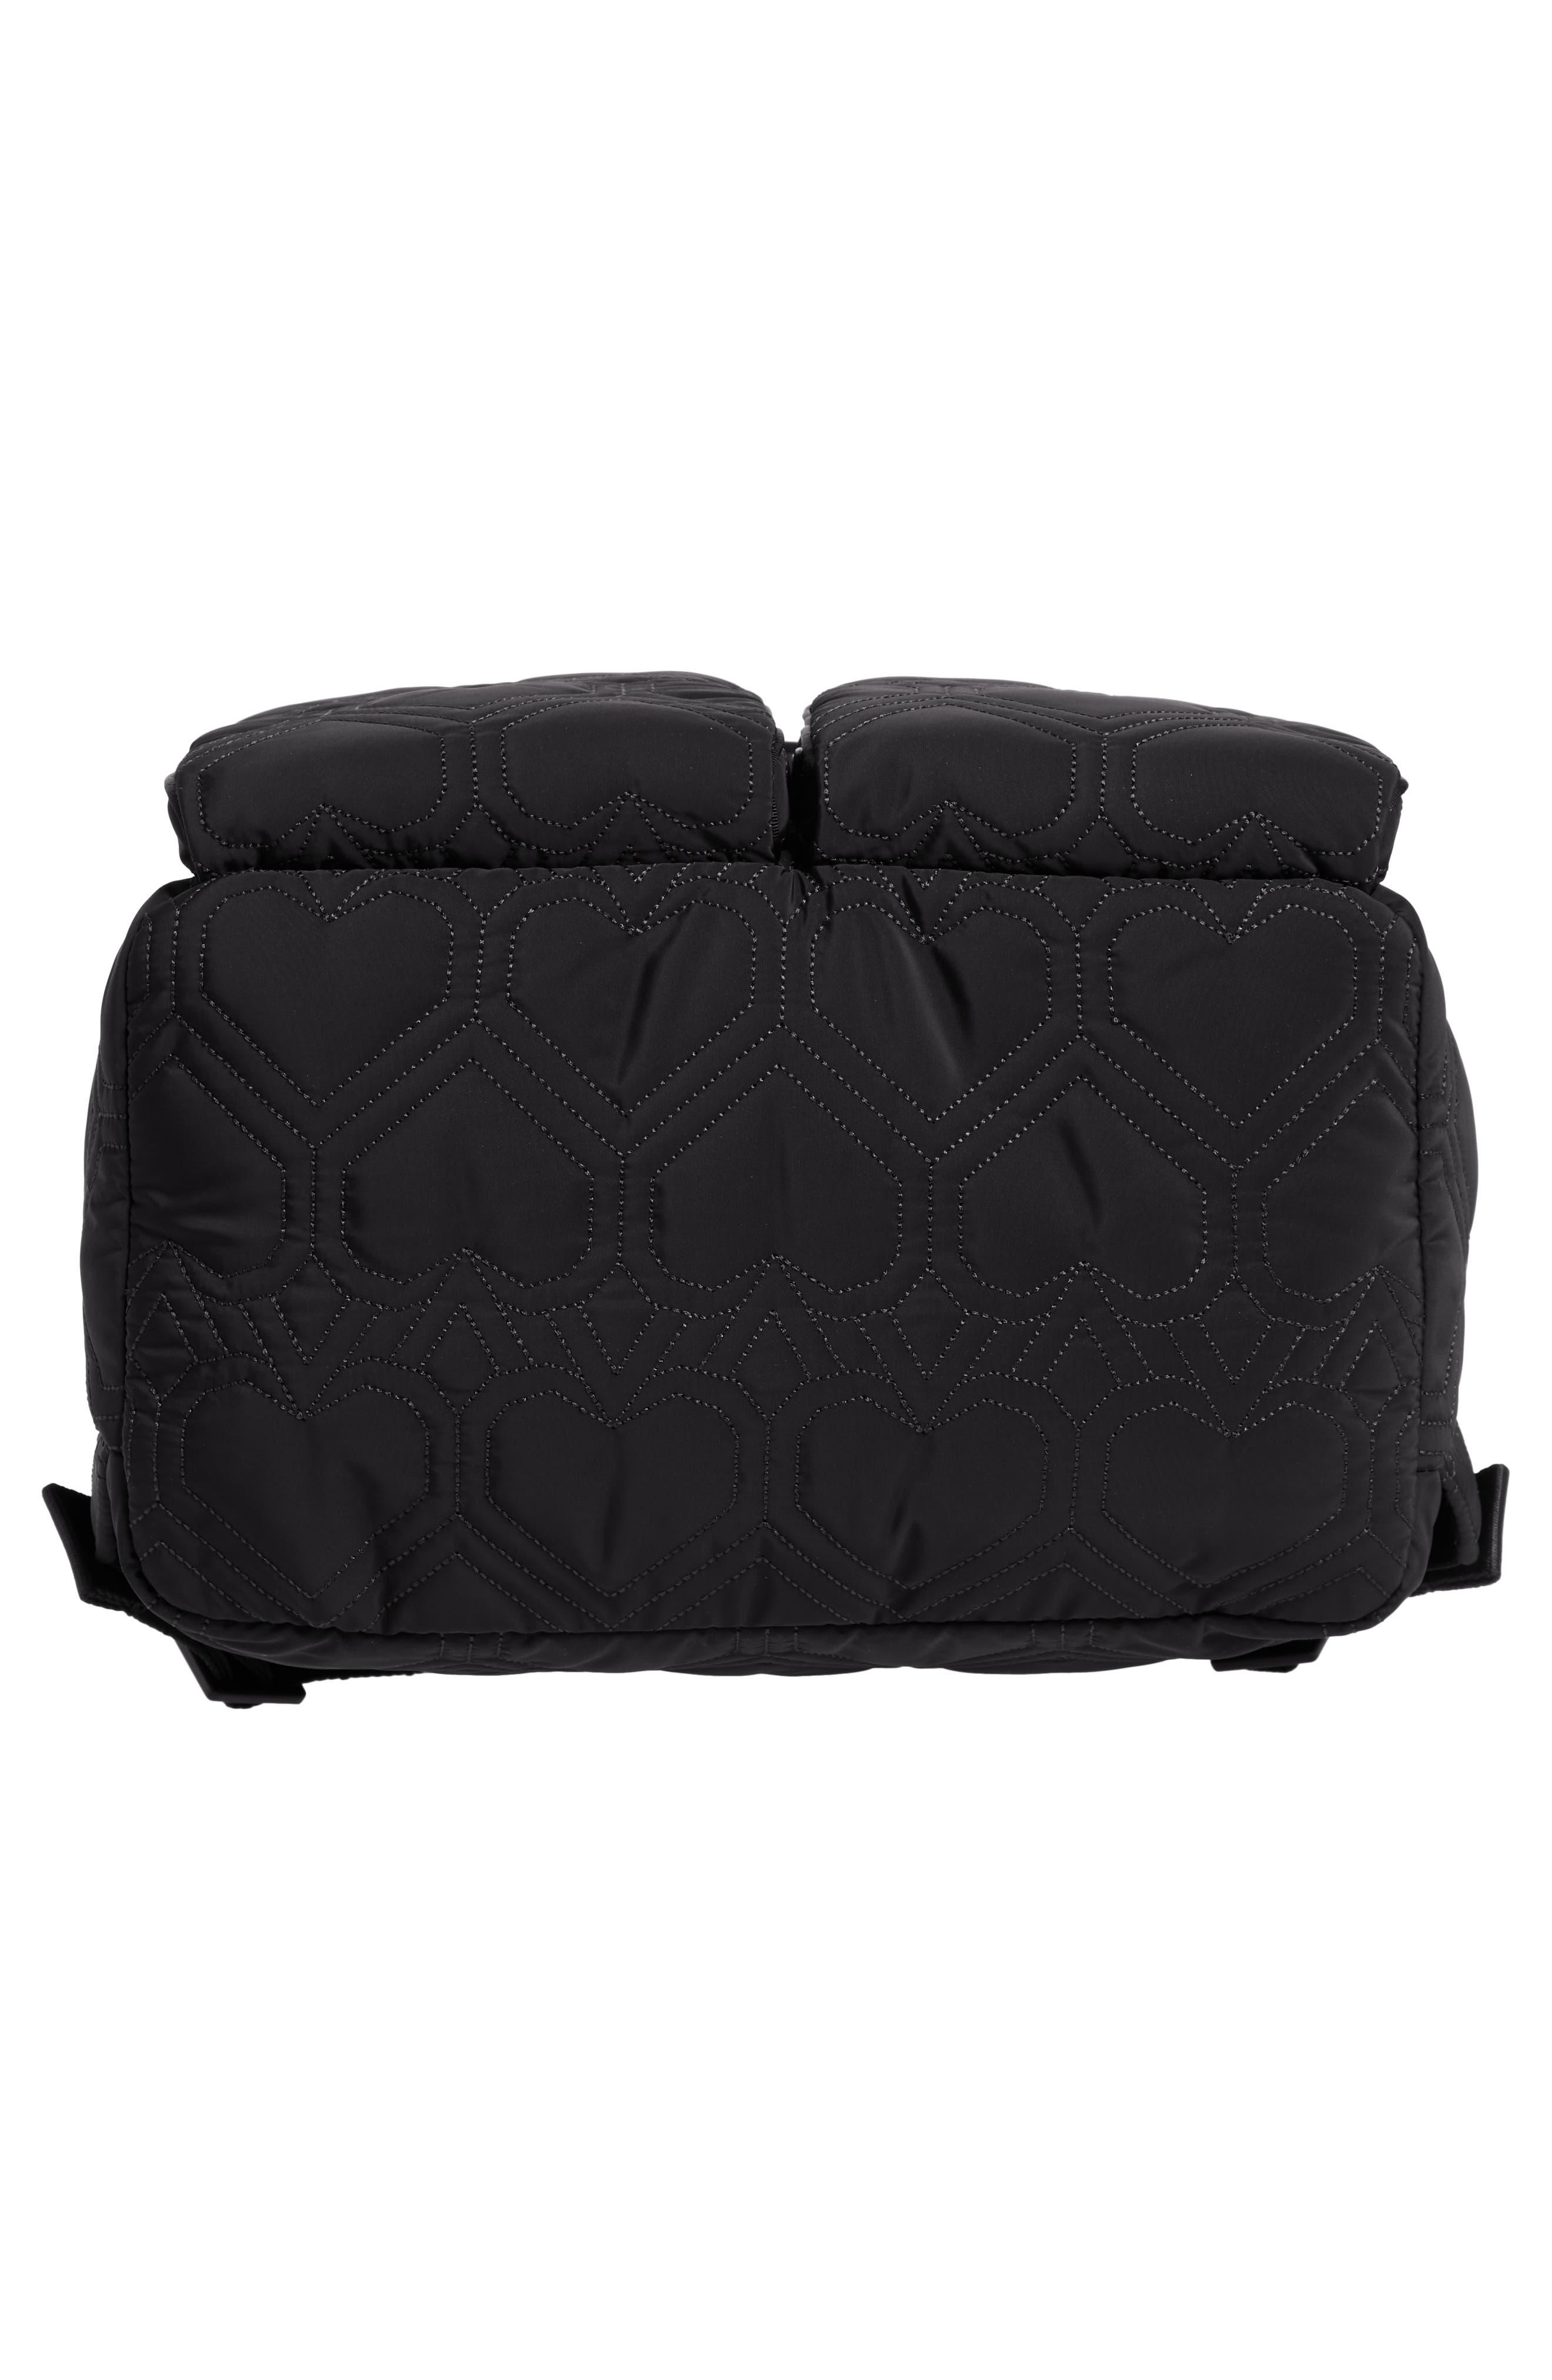 KATE SPADE NEW YORK, large jayne quilted nylon backpack, Alternate thumbnail 6, color, BLACK